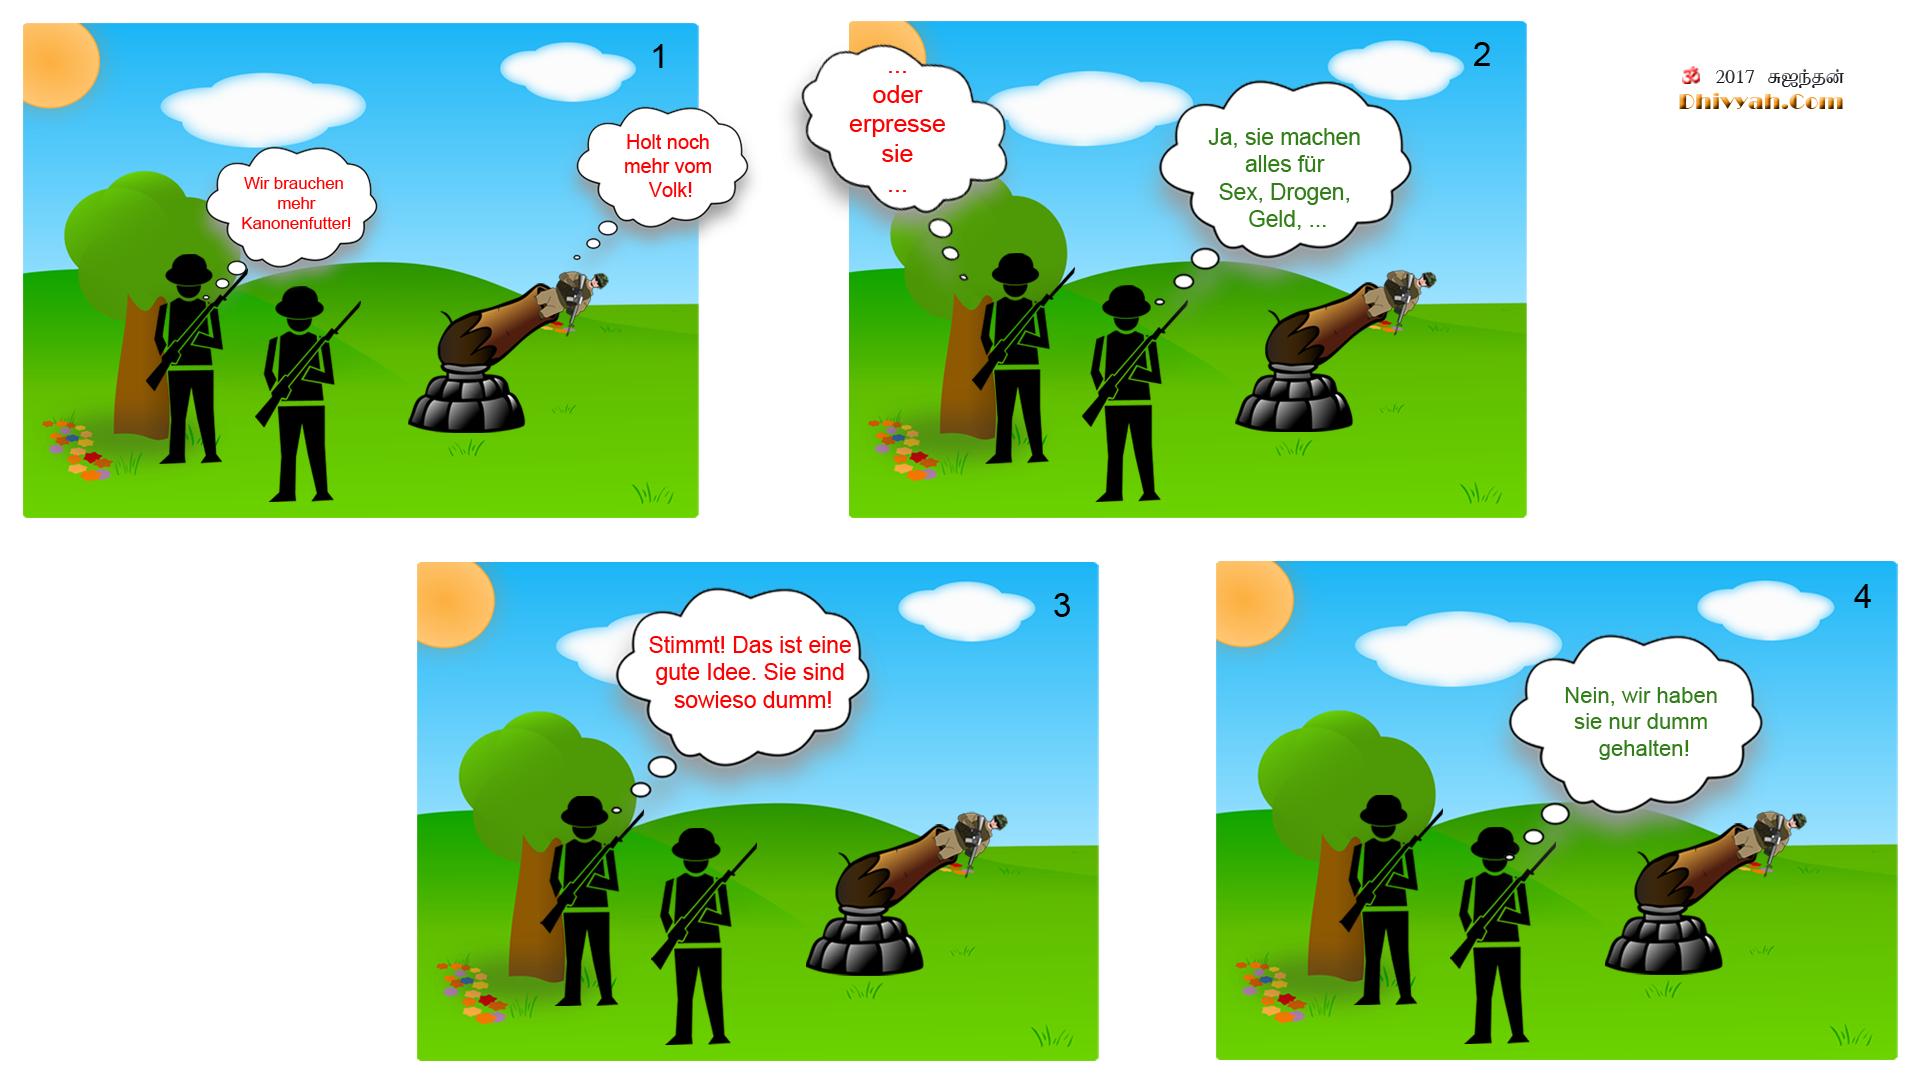 Kanonenfutter